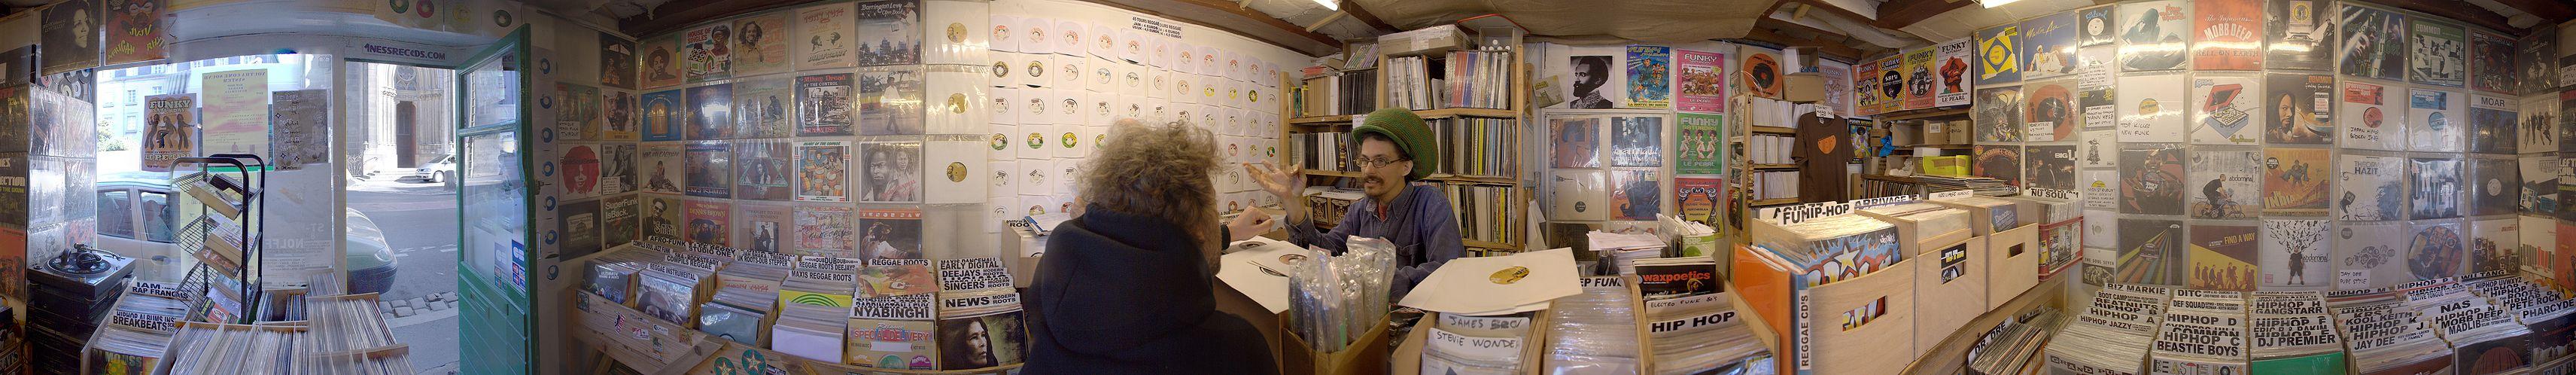 Schallplatten-Shop in Nantes (Frankreich). Foto: Mot2. 2007